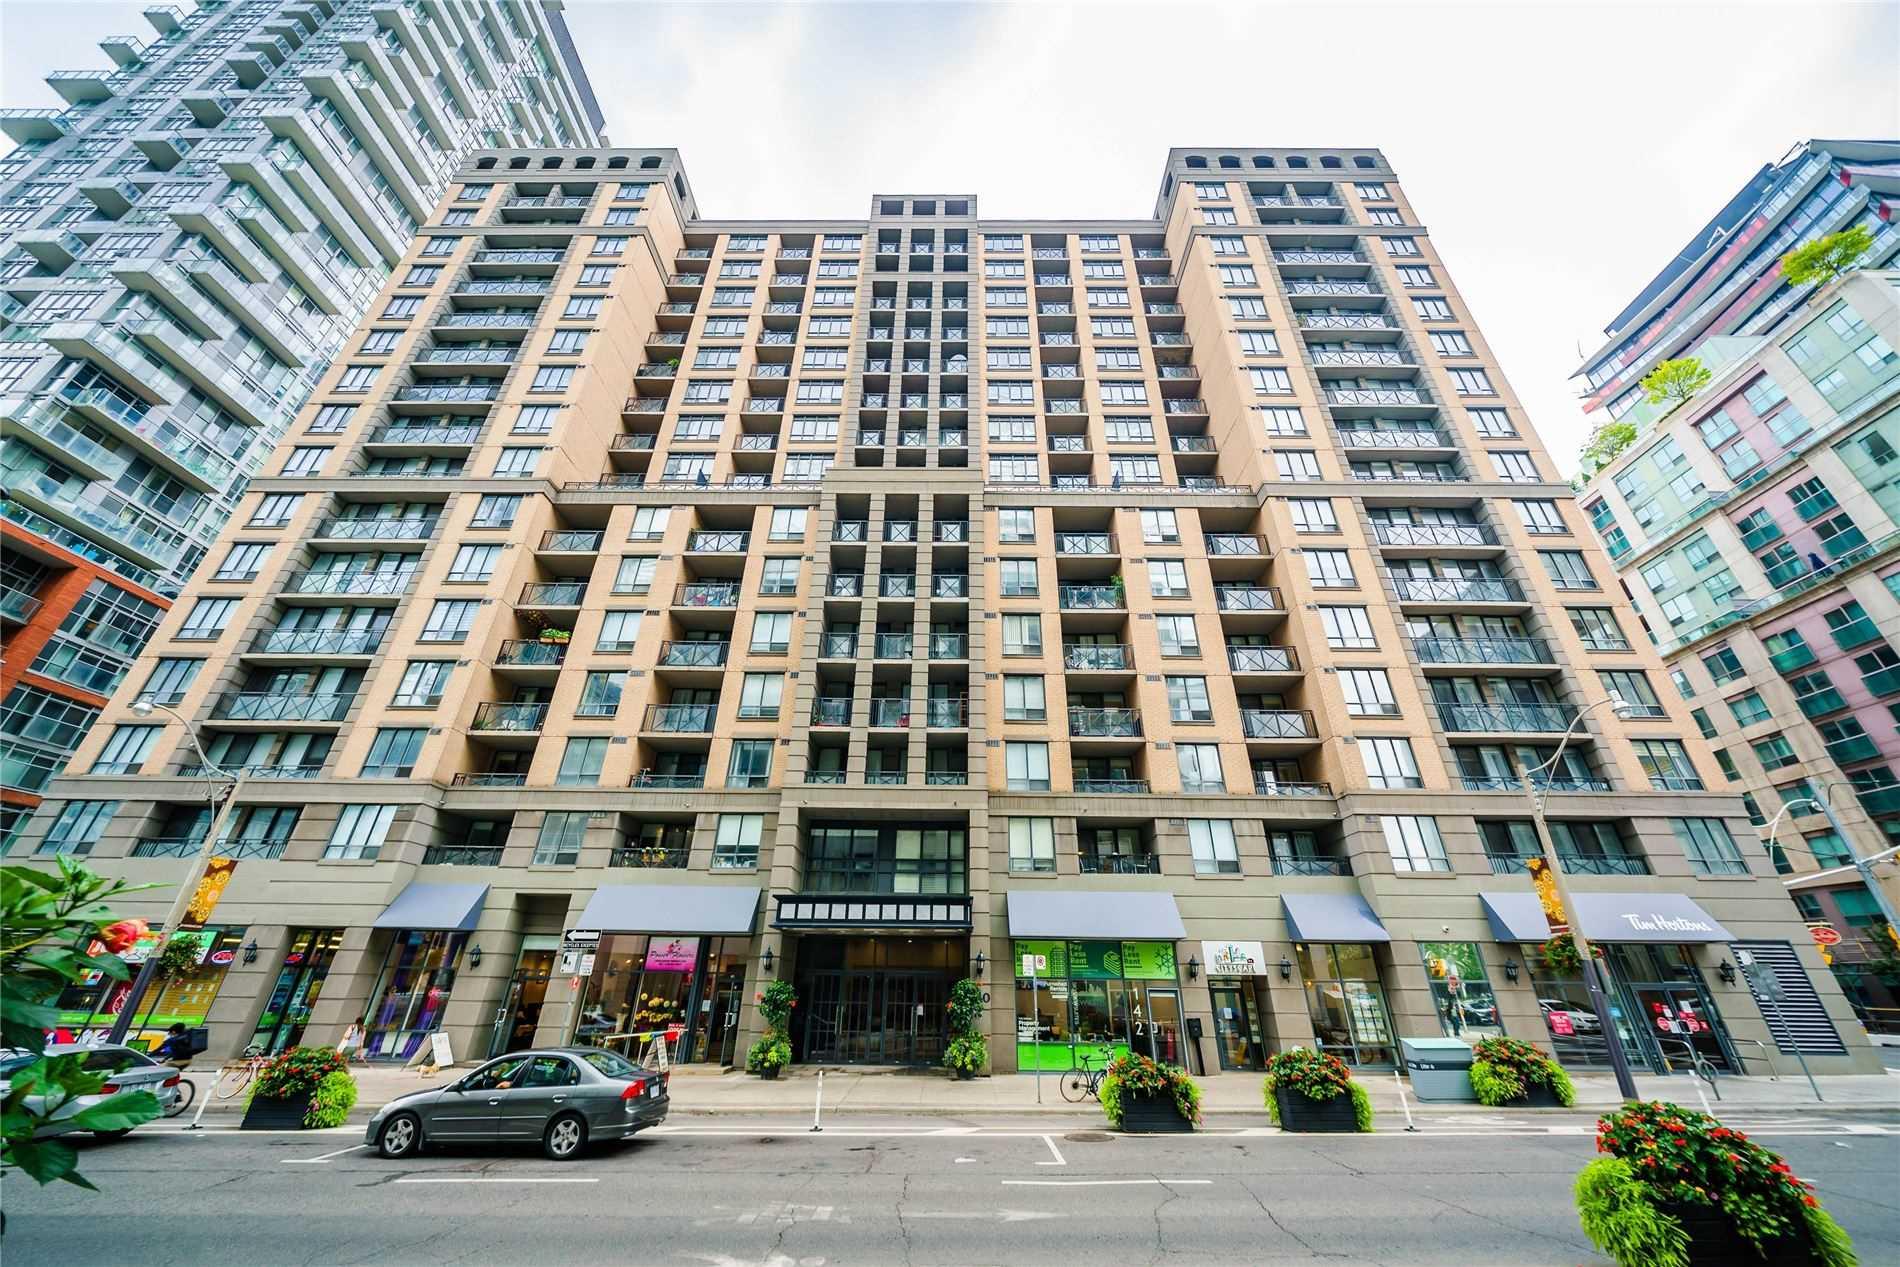 409 - 140 Simcoe St - Waterfront Communities C1 Condo Apt for sale, 2 Bedrooms (C5409430) - #1